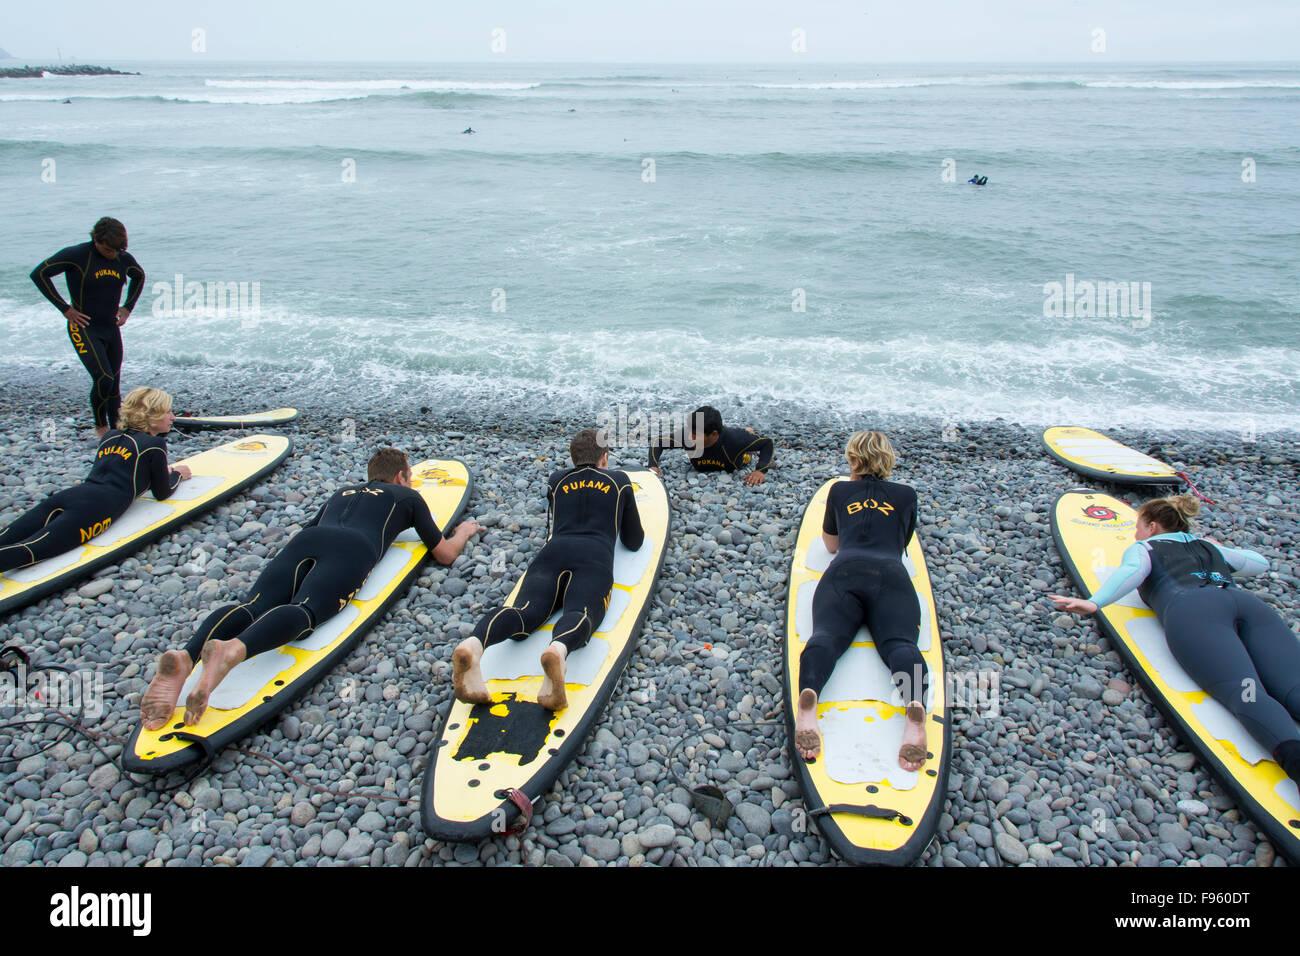 Surfing lessons, Miraflores suburb, Lima, Peru - Stock Image